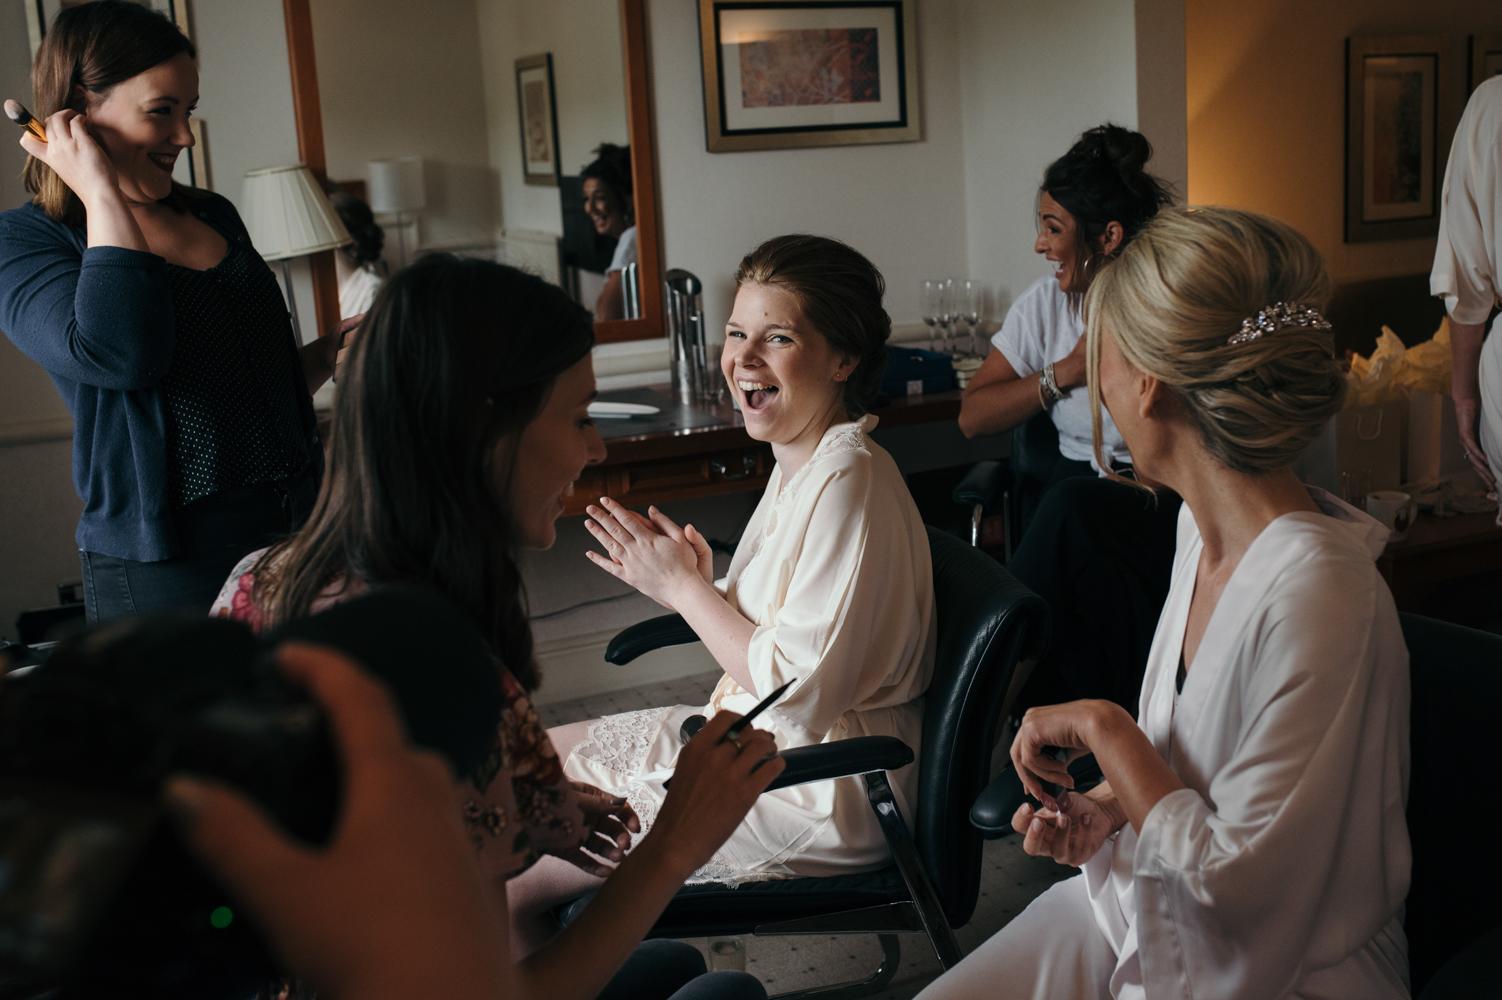 A bridesmaid having a good laugh during morning preparations